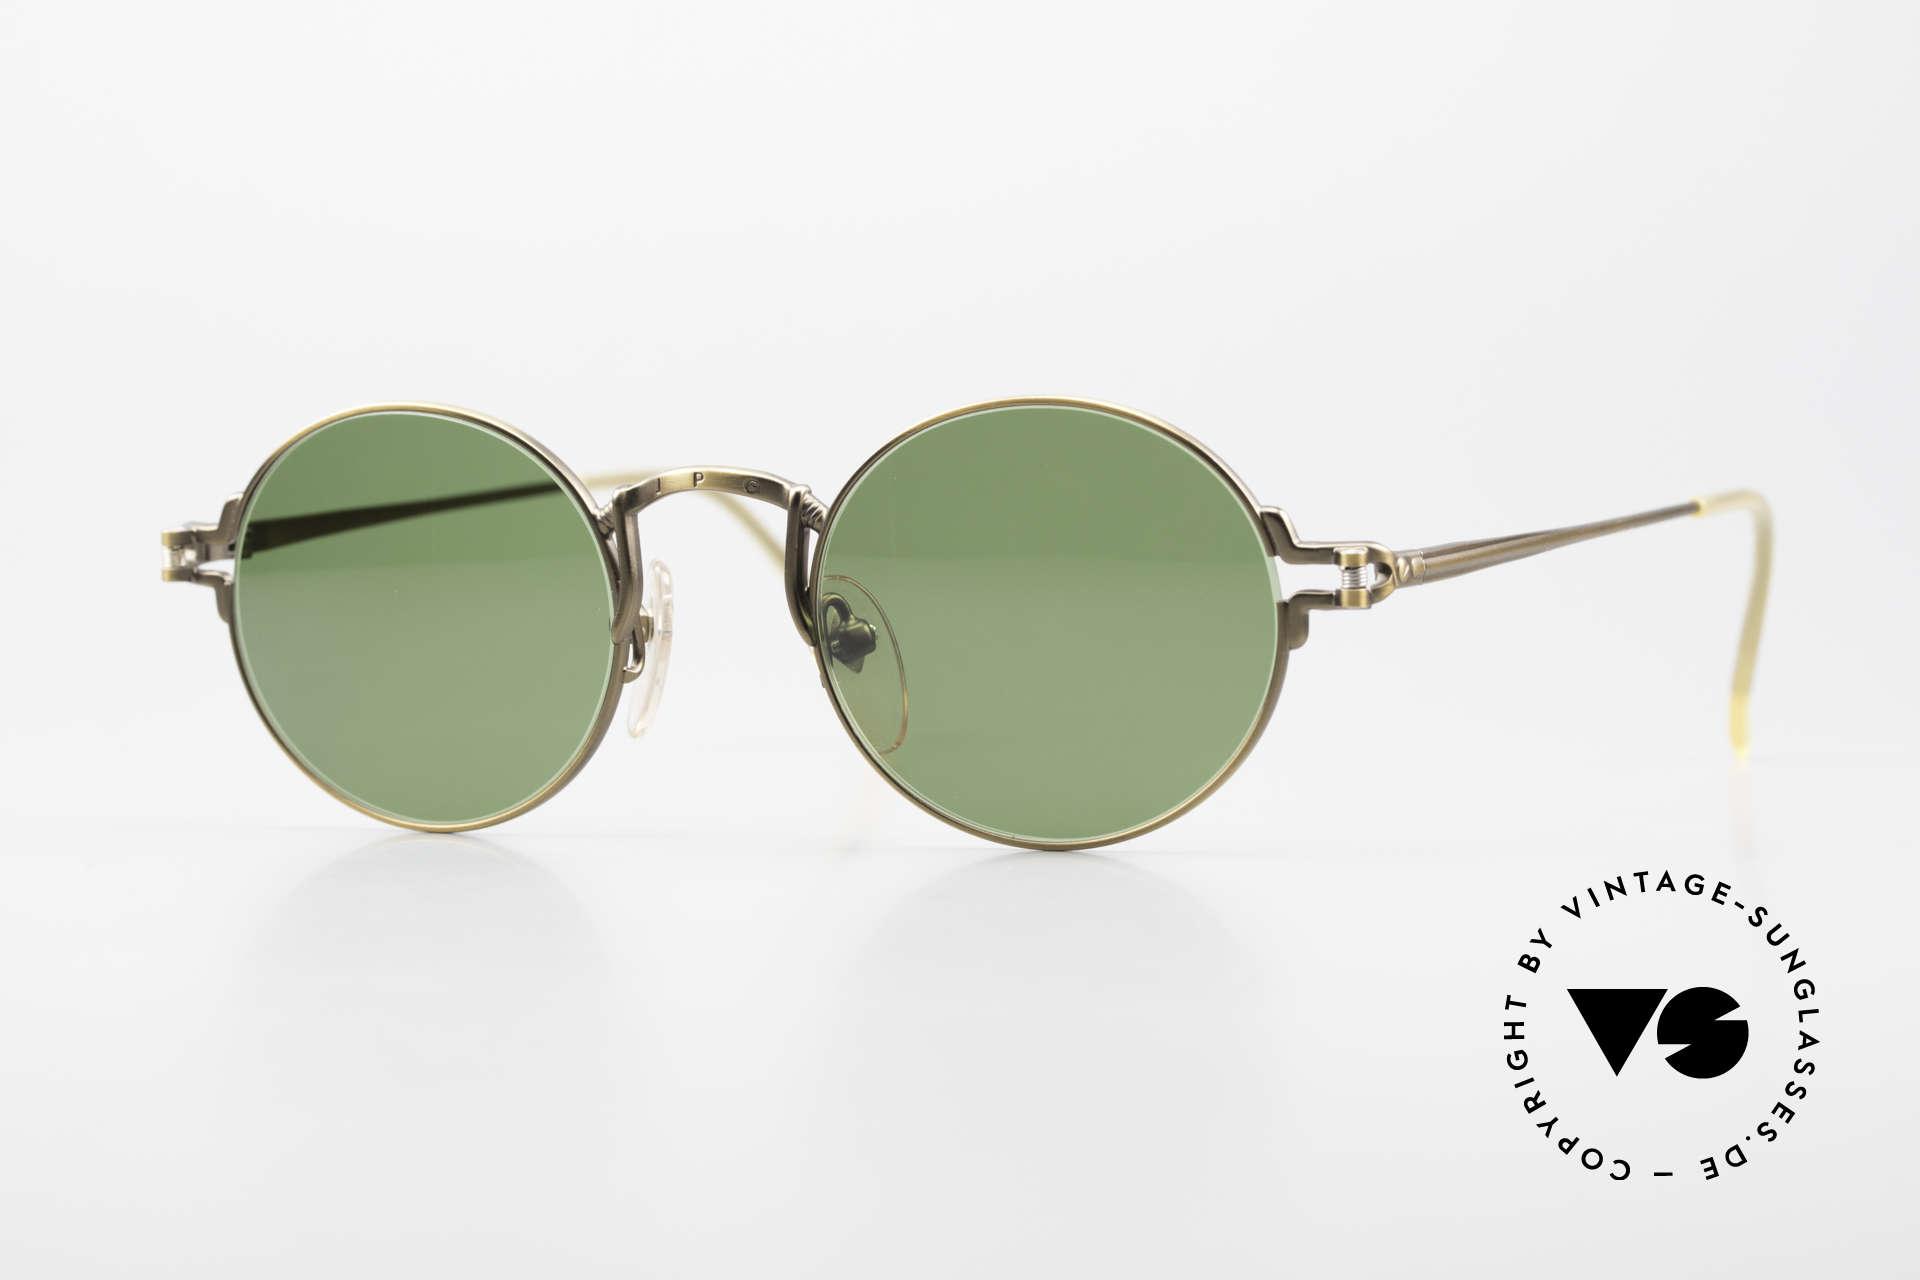 Jean Paul Gaultier 55-3171 Round 90's JPG Sunglasses, noble, round Jean Paul GAULTIER vintage sunglasses, Made for Men and Women